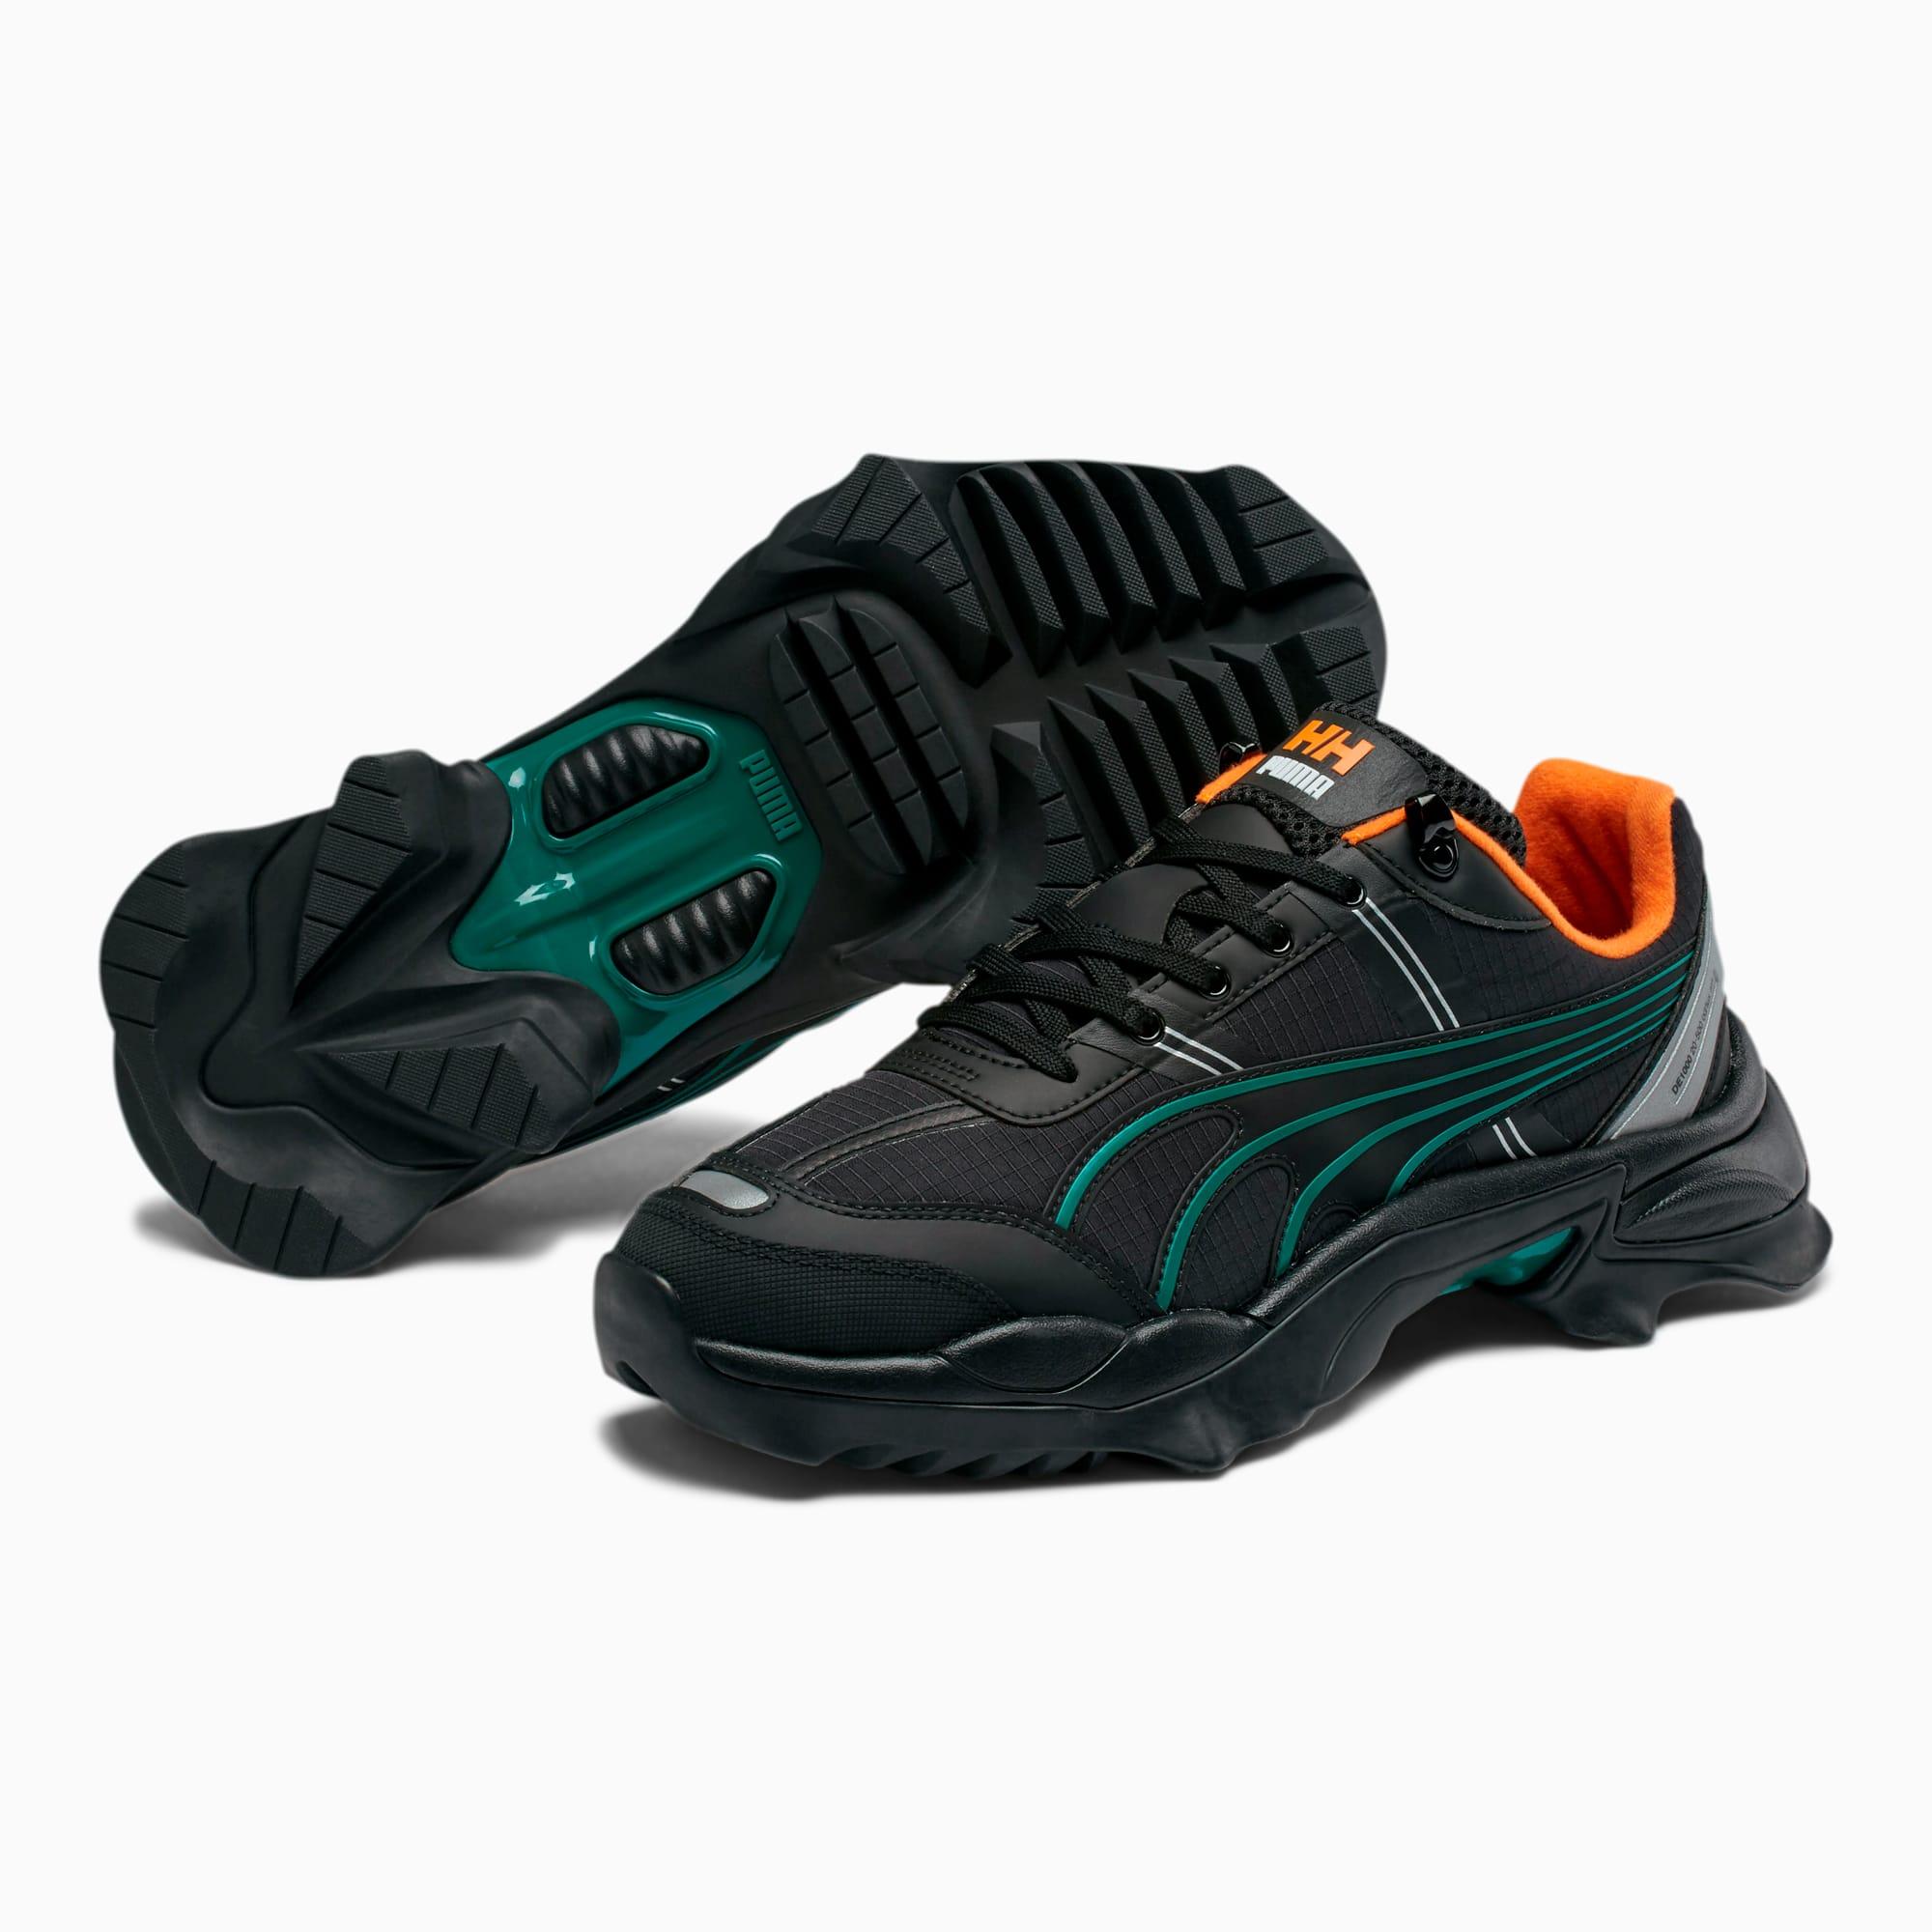 PUMA x HELLY HANSEN Nitefox Sneakers